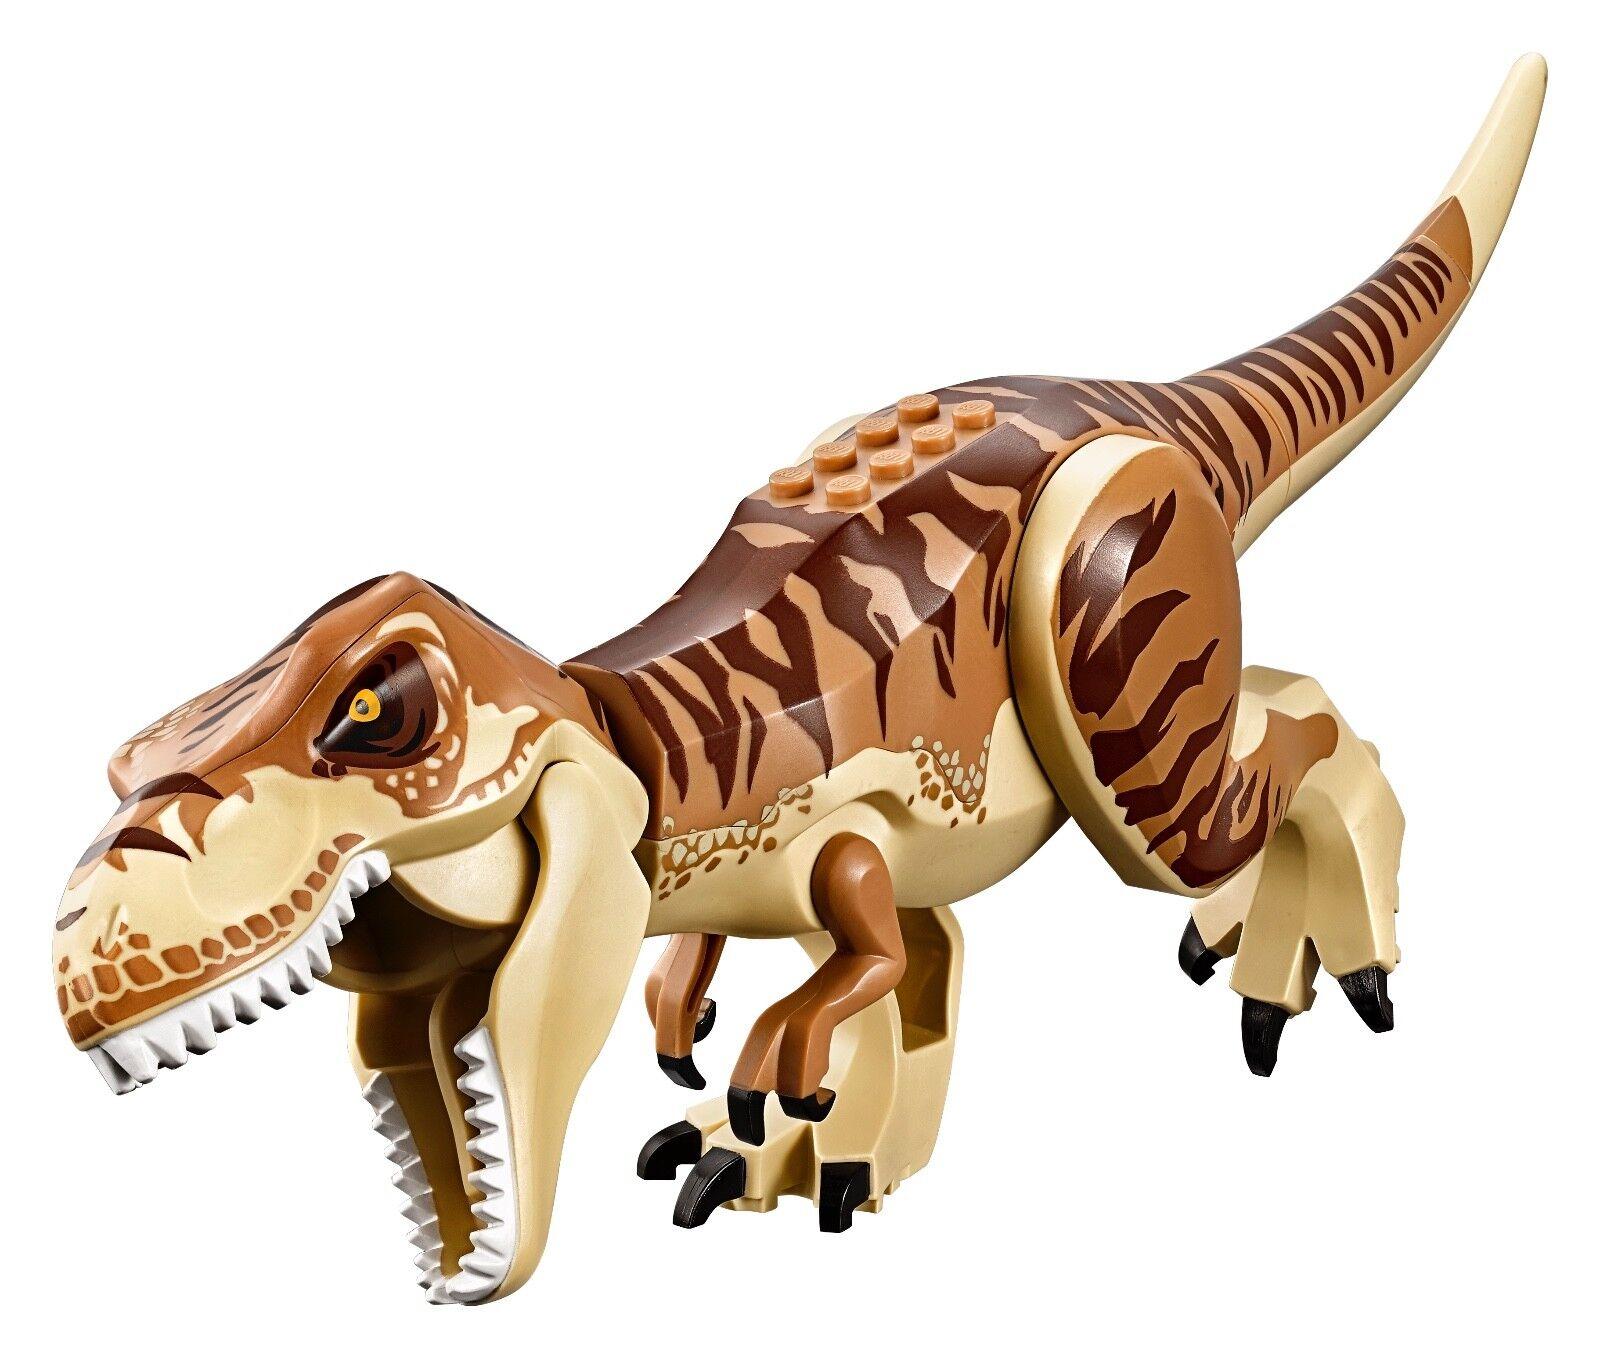 LEGO Jurassic World - T-Rex Dinosaur from 75933 T.Rex Transport